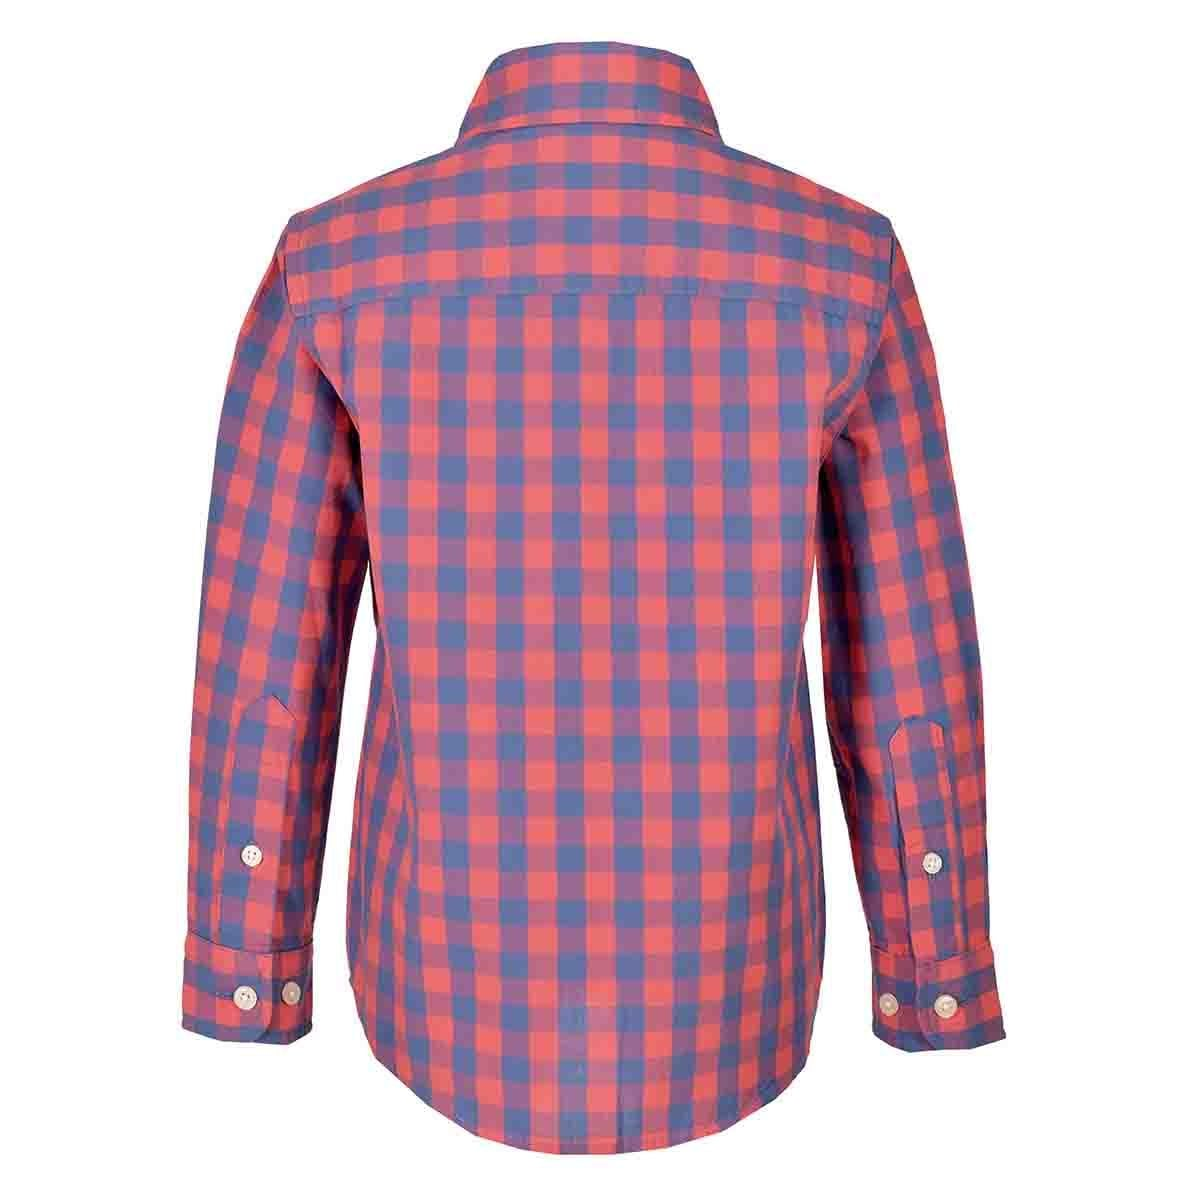 Camisa Manga Larga Gingham Jeanious